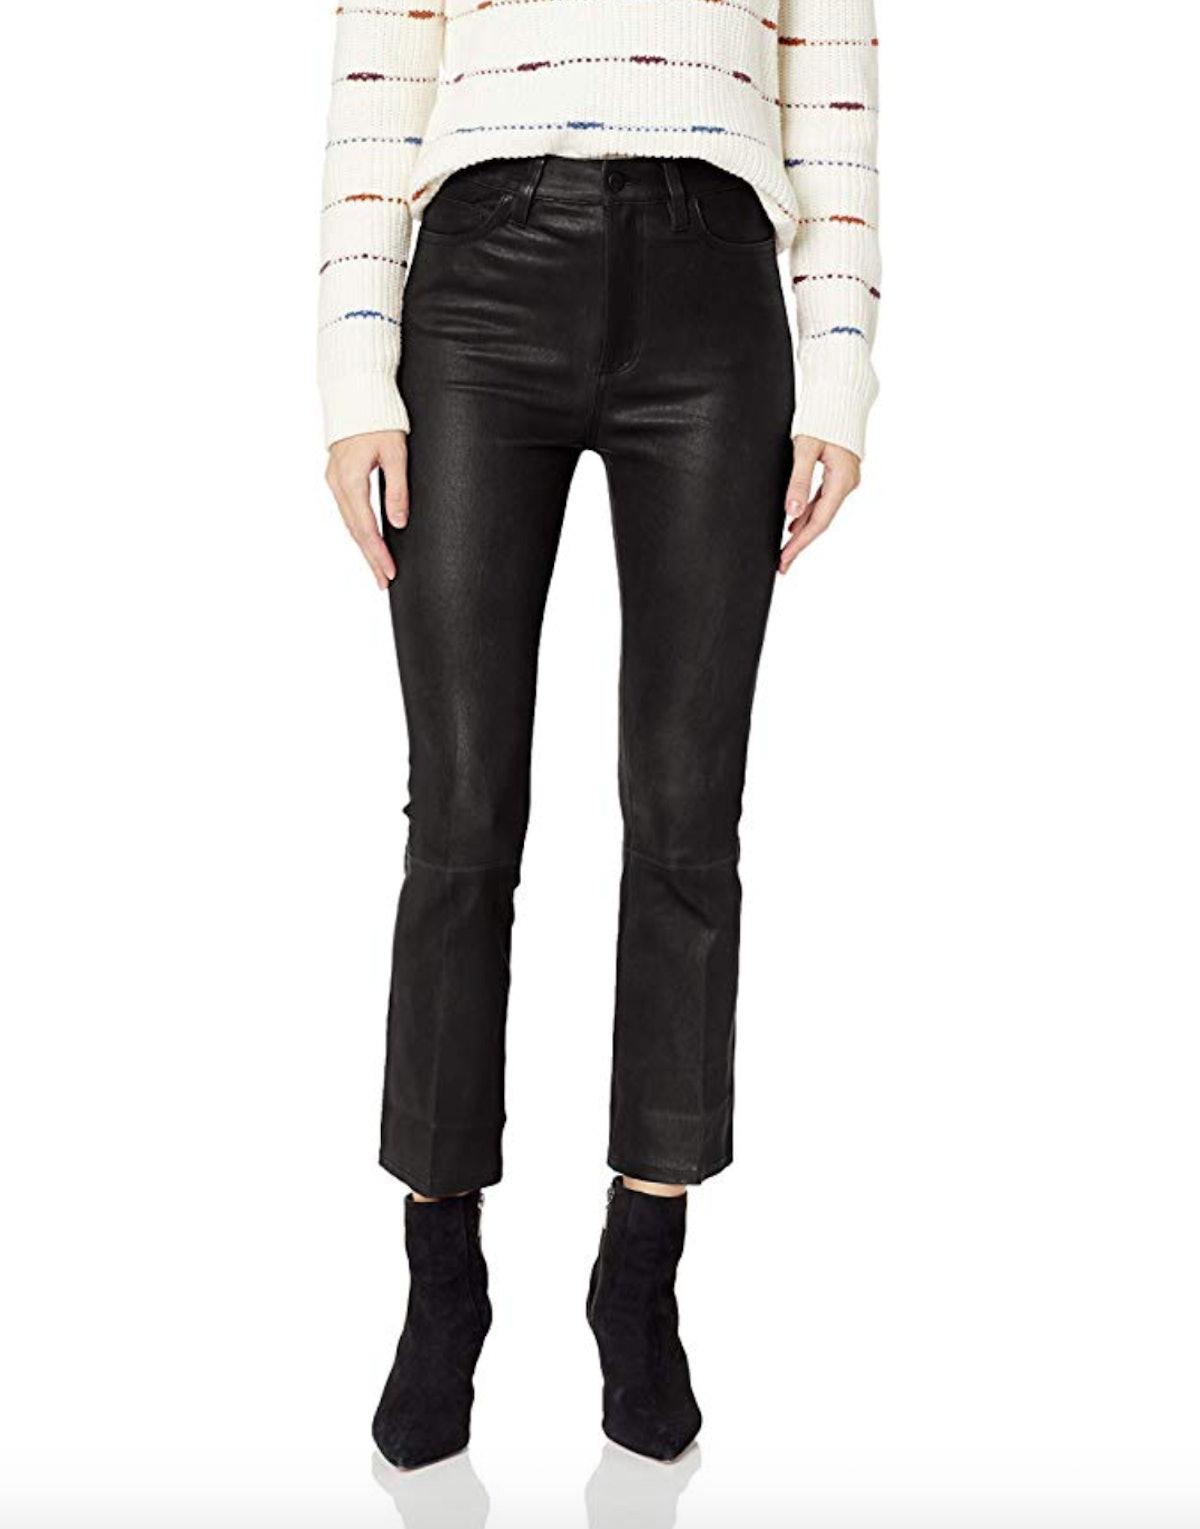 Callie High-Rise Cropped Boot Jean